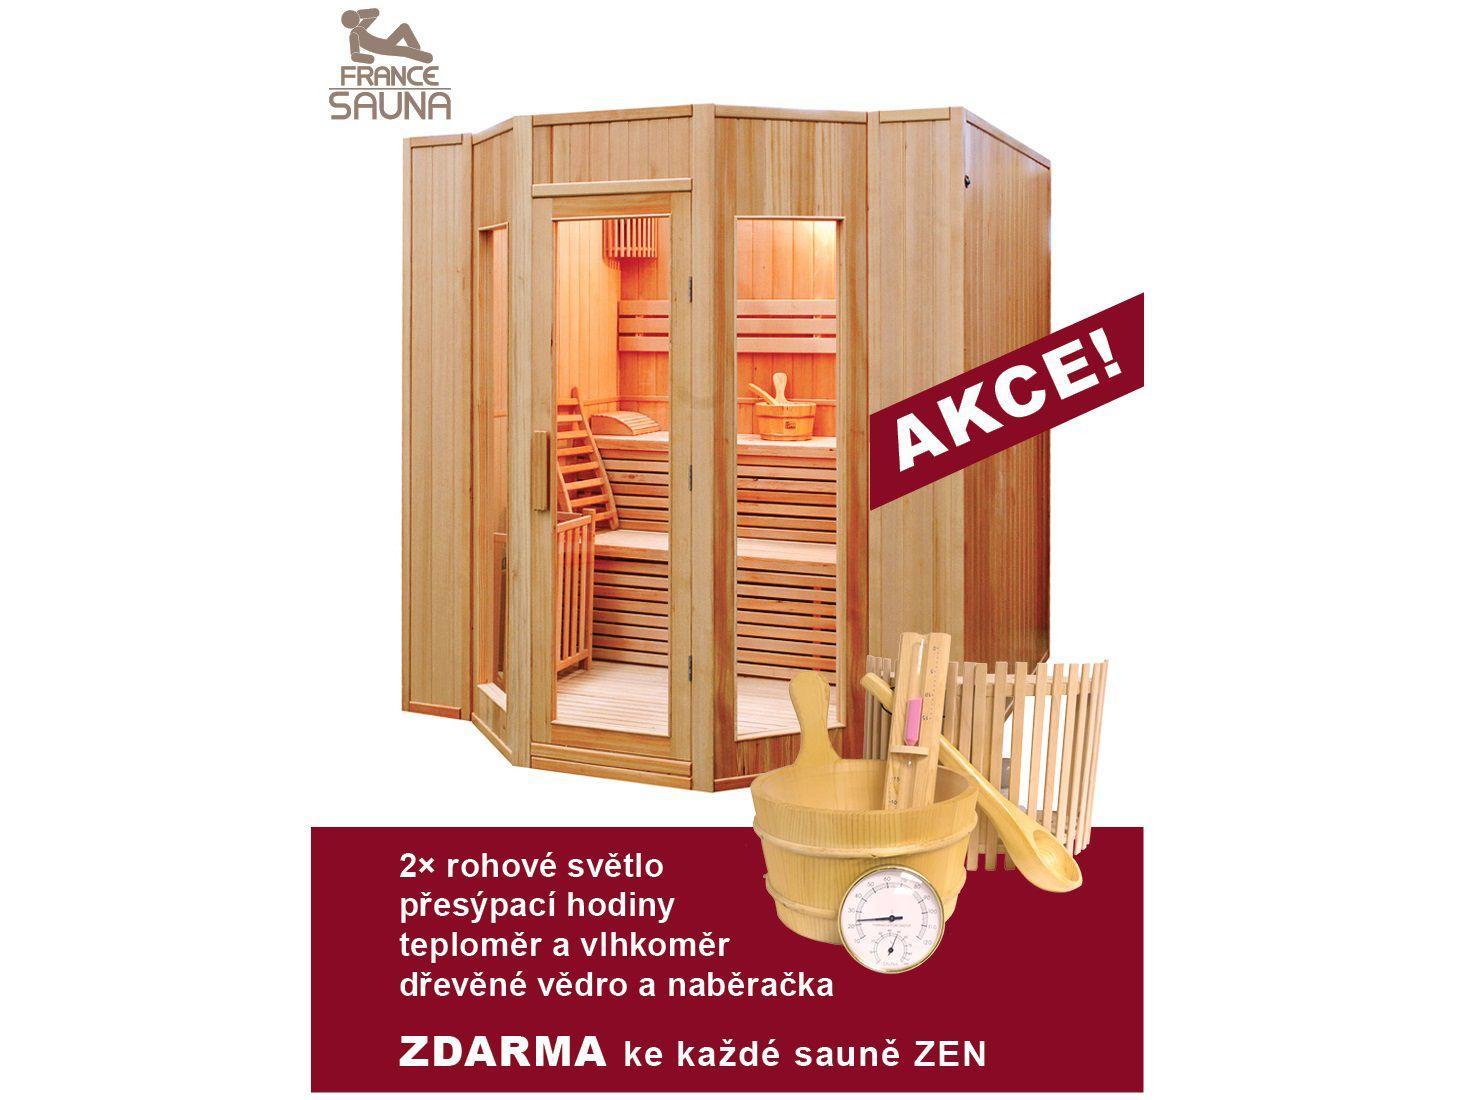 Hanscraft Zen 5 finská sauna pro 5 osob + Doprava a dárek ZDARMA (FRANCE SAUNA Zen 5)